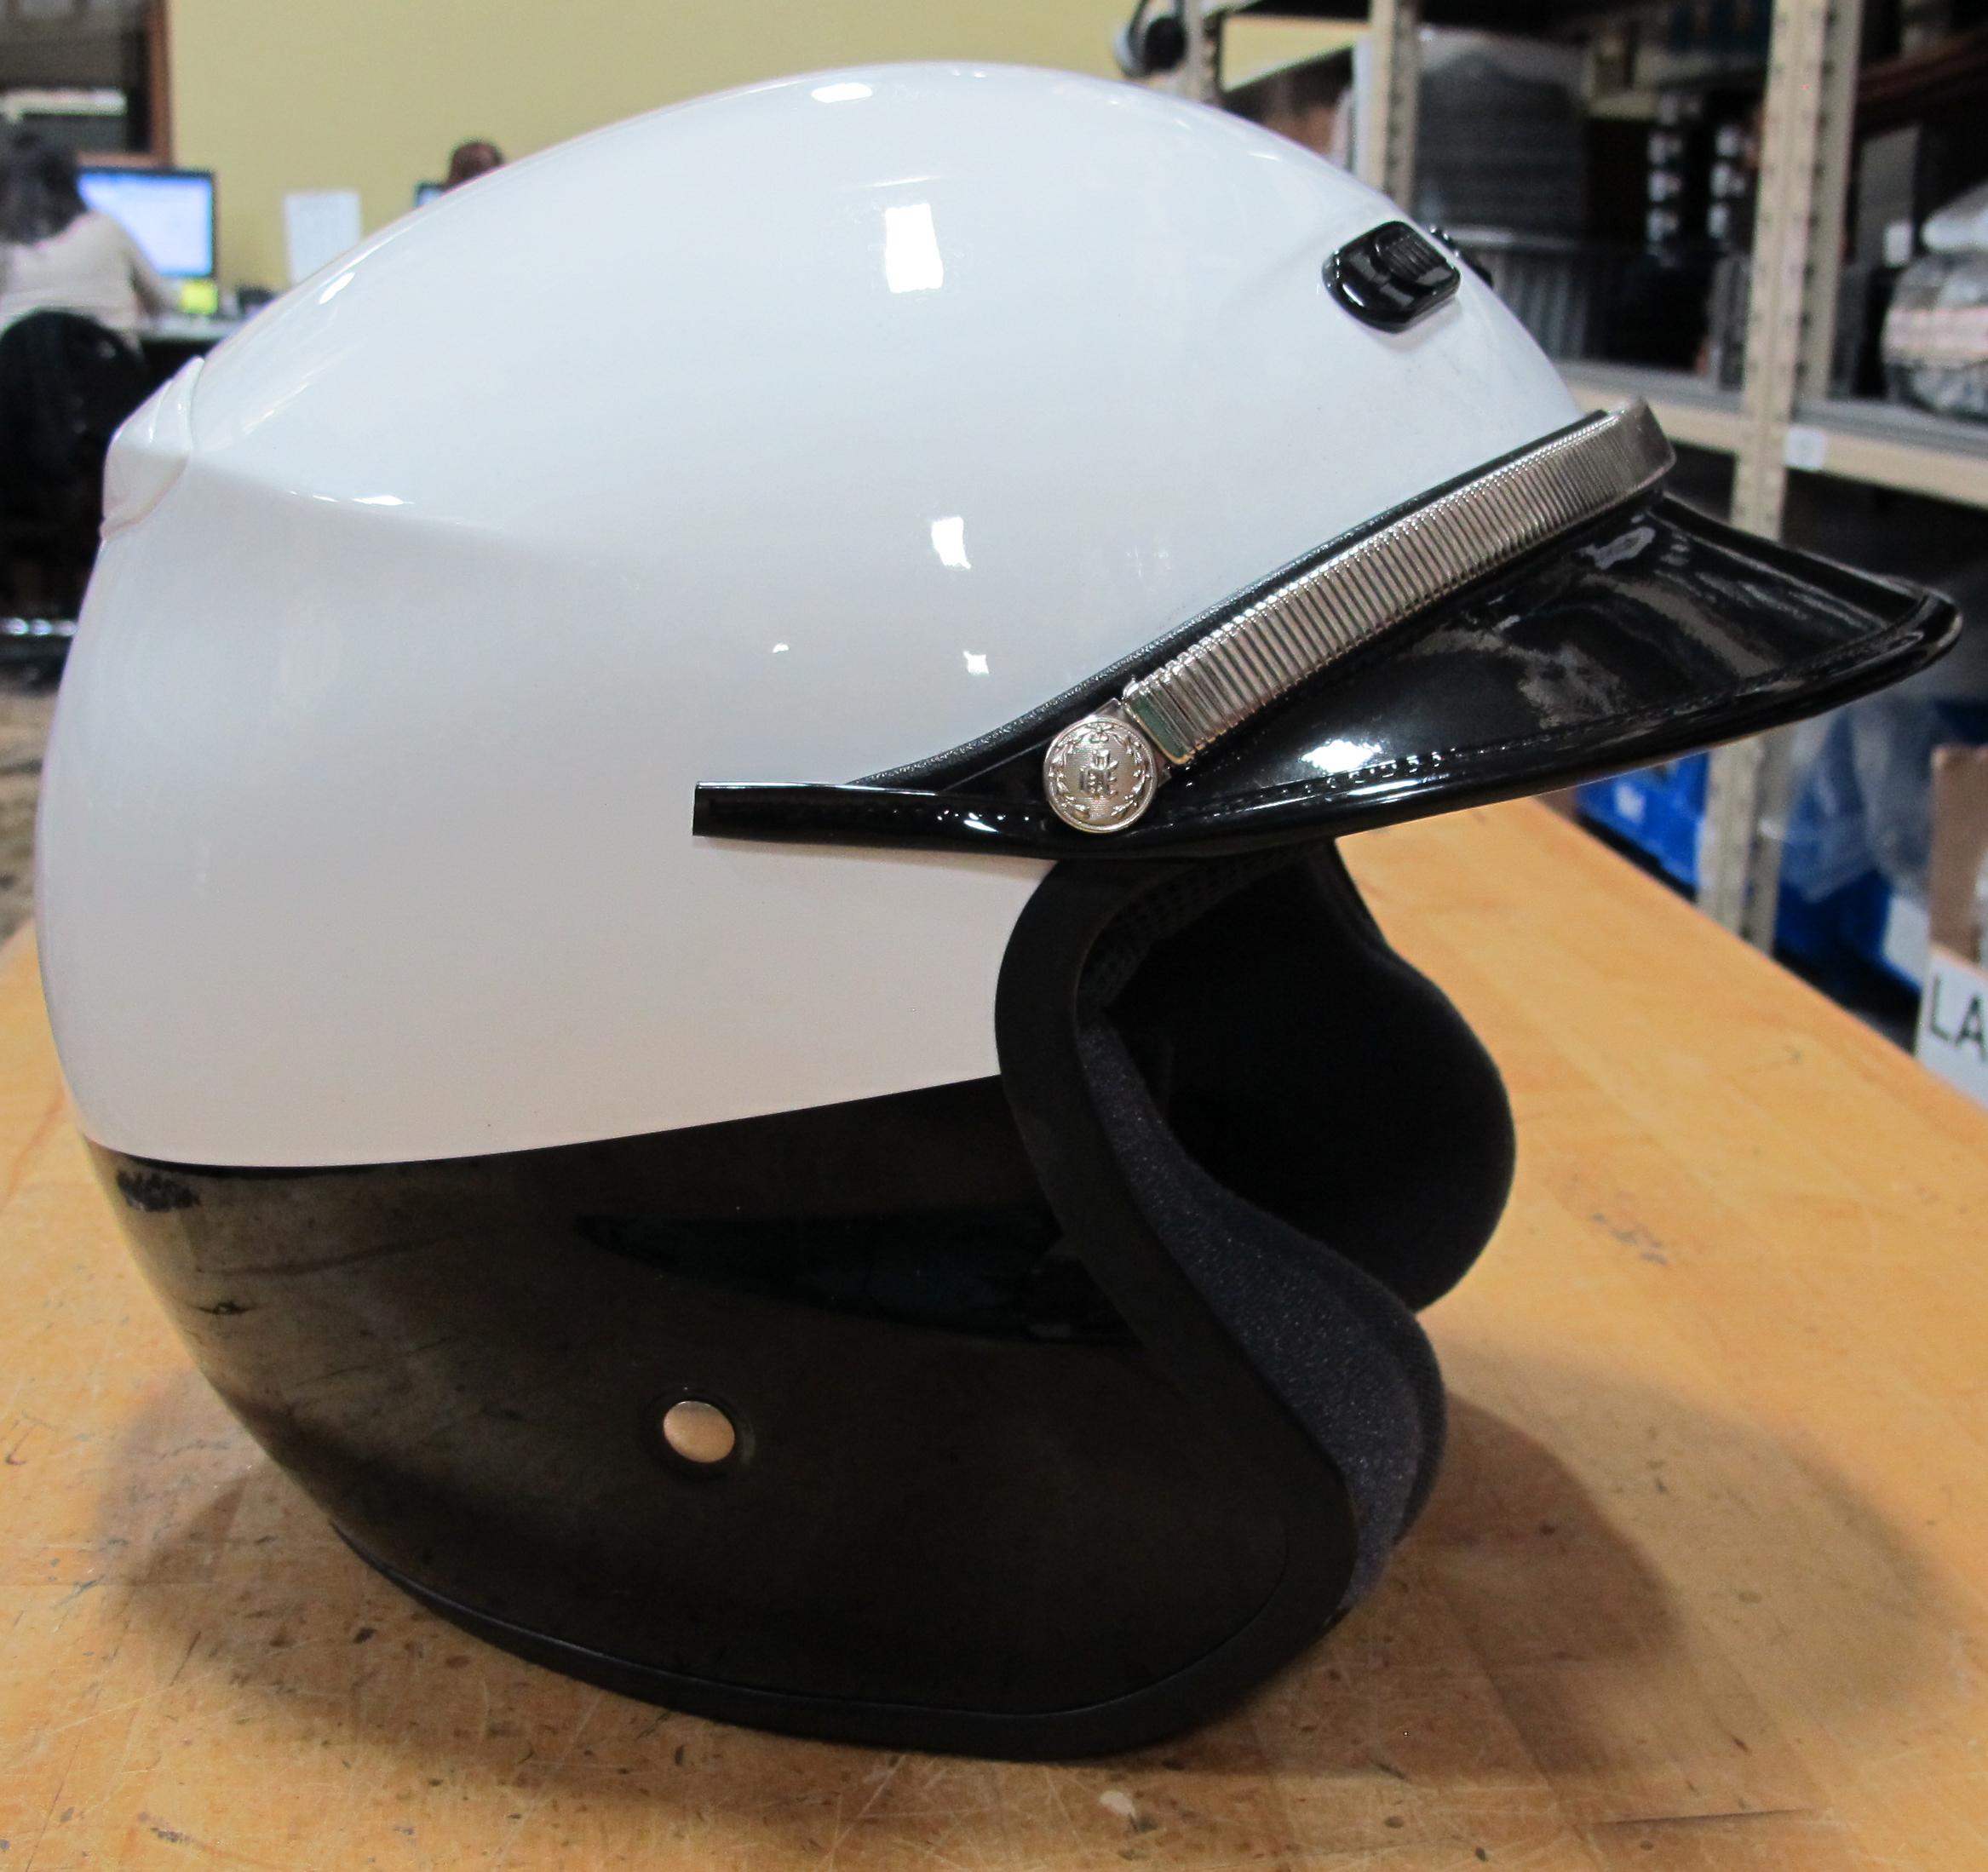 Shoei RJ Platinum LE Open Face Police Helmet BlackWhite  : img0866 <strong>Cop</strong> Helmet from www.ebay.com size 2334 x 2198 jpeg 2242kB